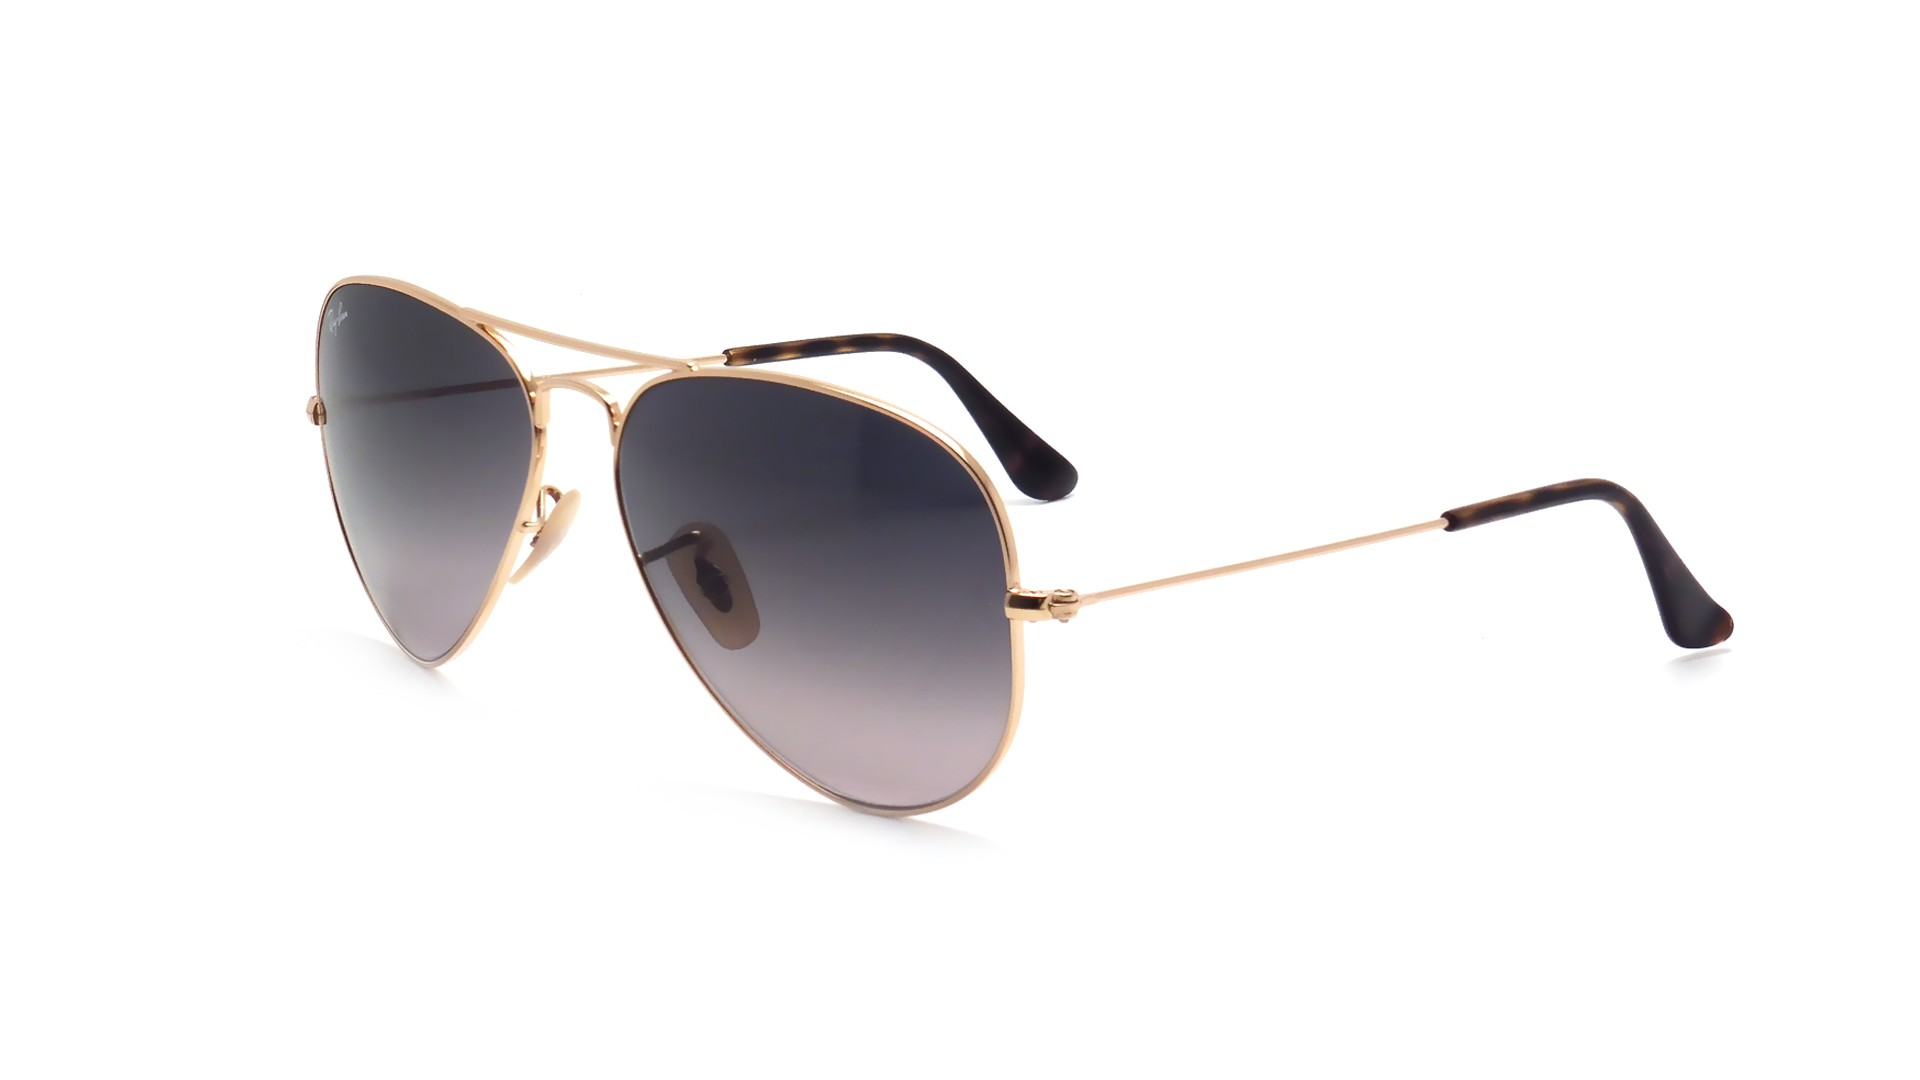 dcf5ddd7c Sunglasses Ray-Ban Aviator Large Metal Gold RB3025 181/71 58-14 Medium  Gradient